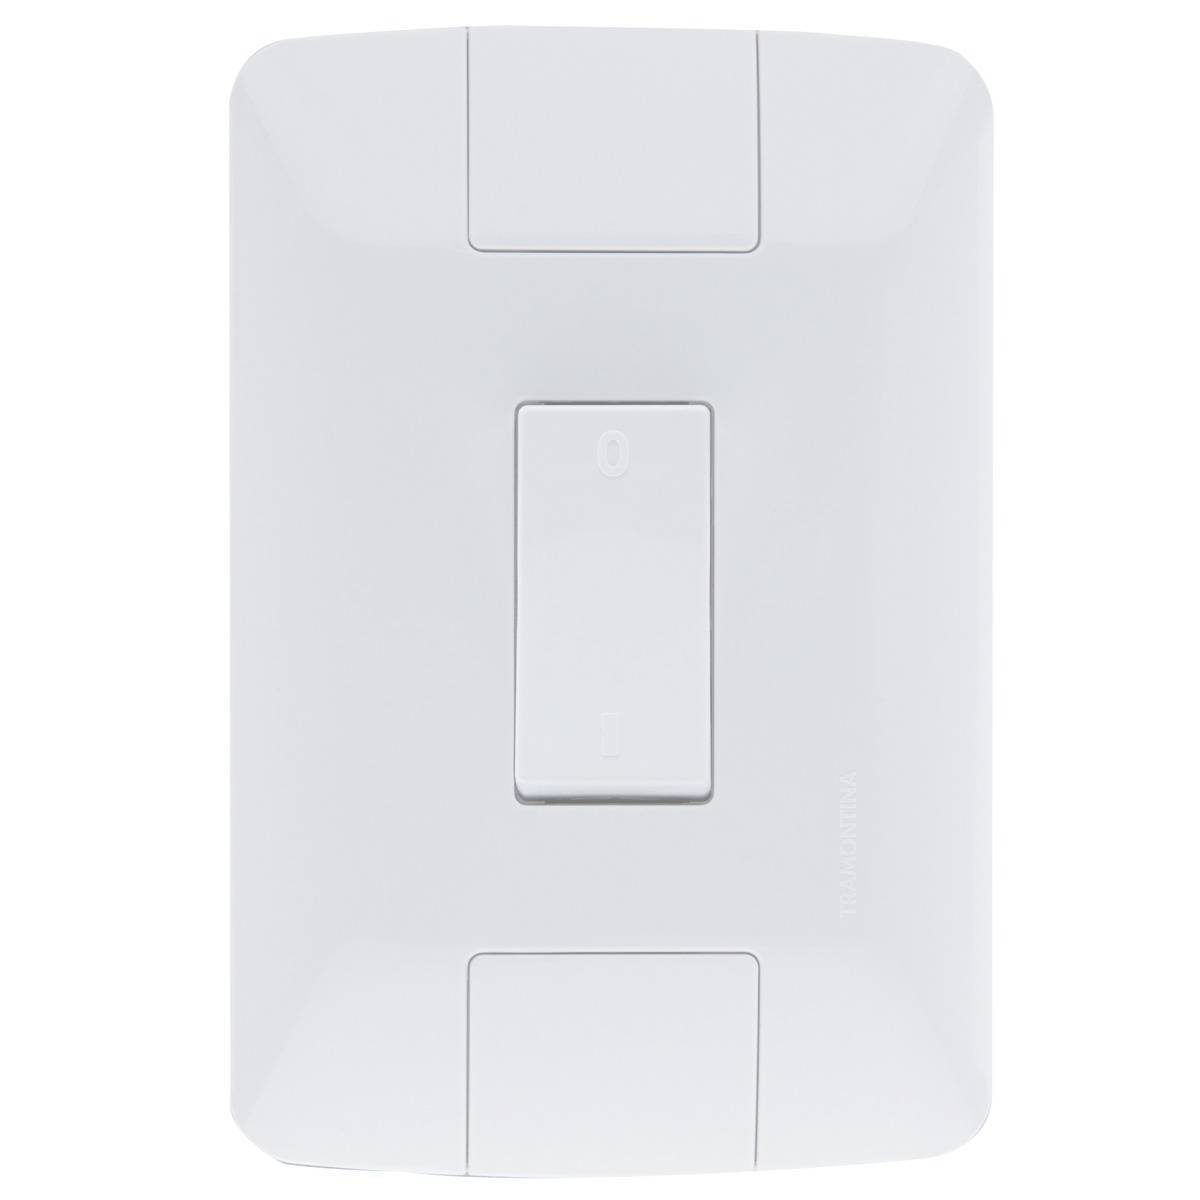 Conjunto Montado Aria 4x2 1 Interruptor Bipolar Simples 10a  - LCGELETRO